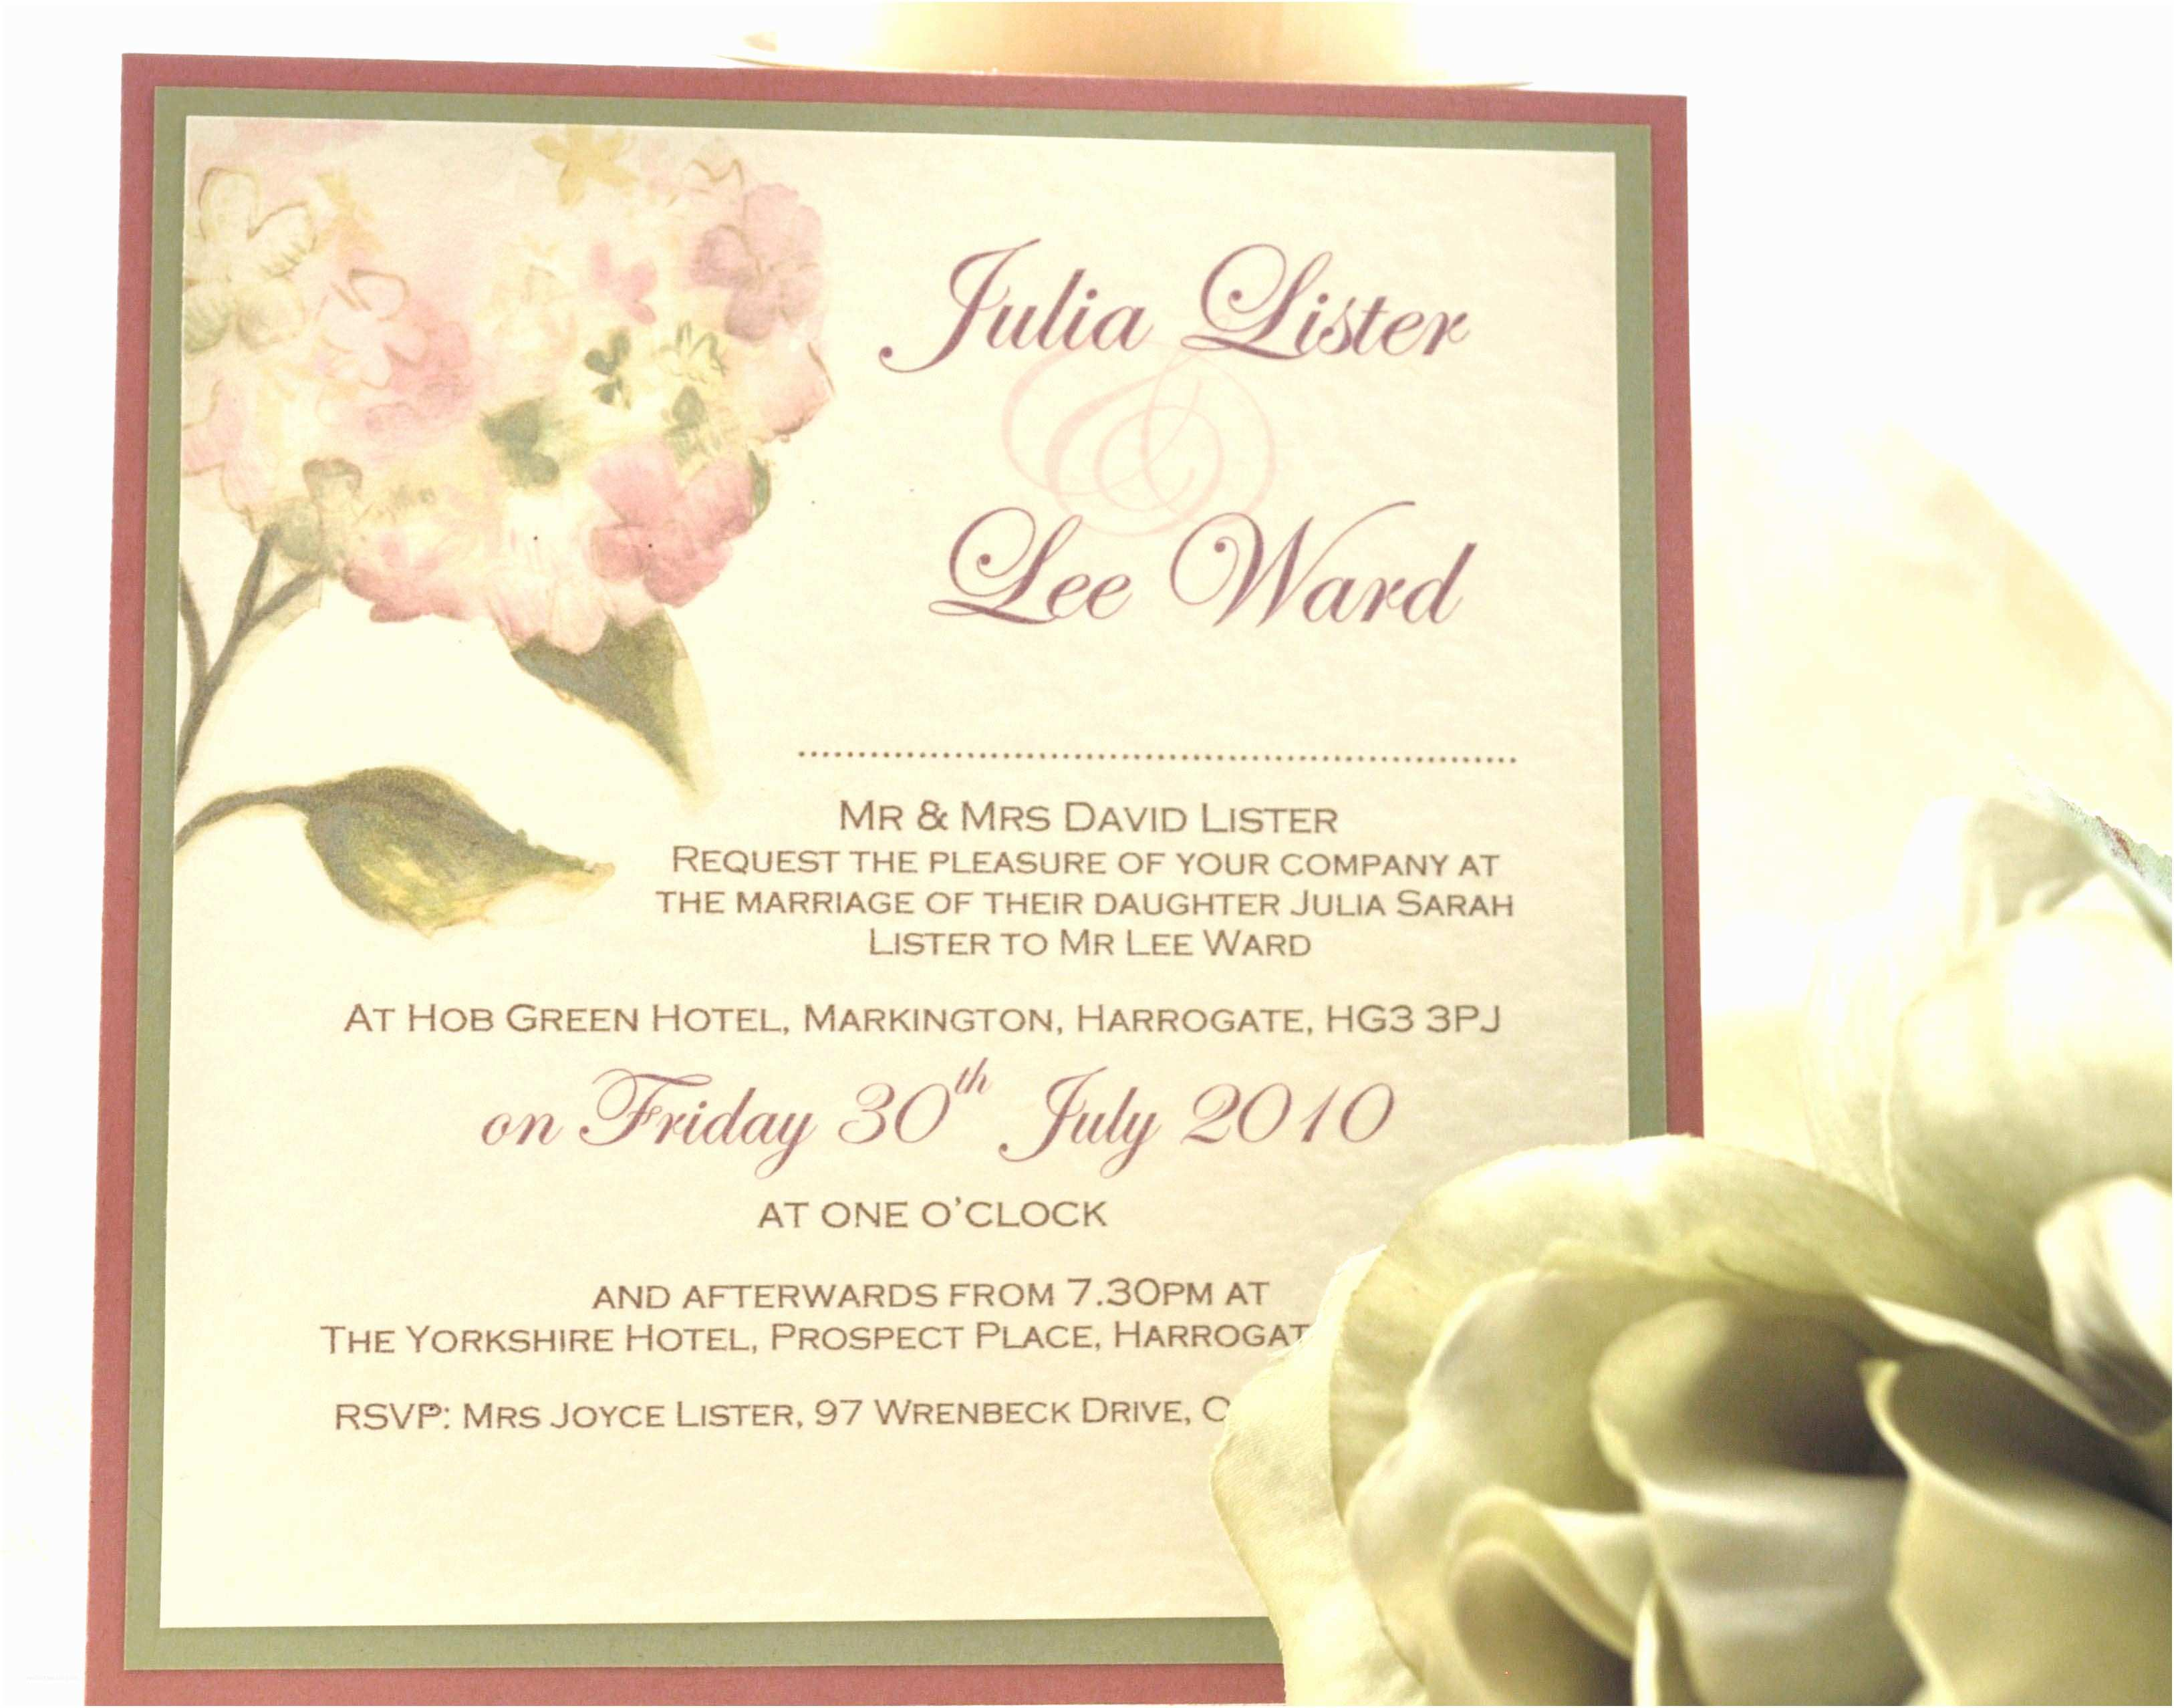 Wedding Invitation Design Images Wedding Invitation Wording Wedding Invitation Template Sample